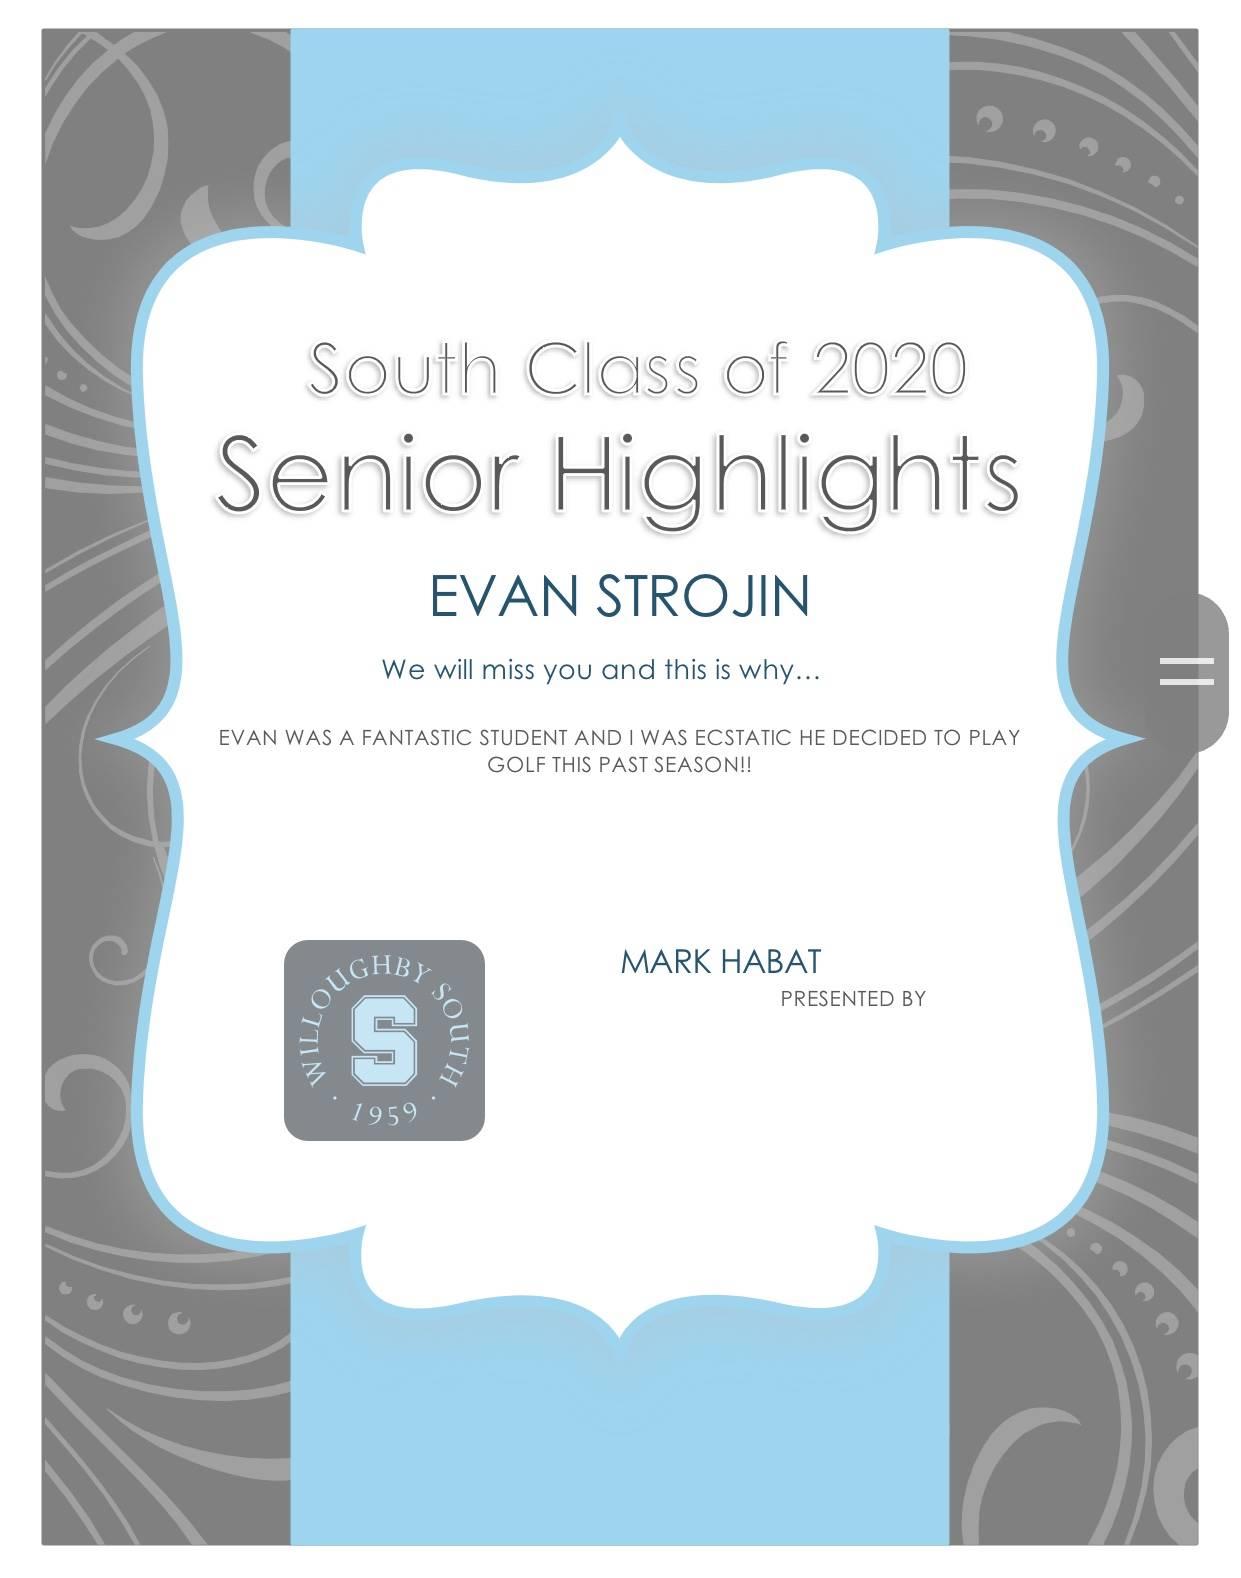 Evan Strojin